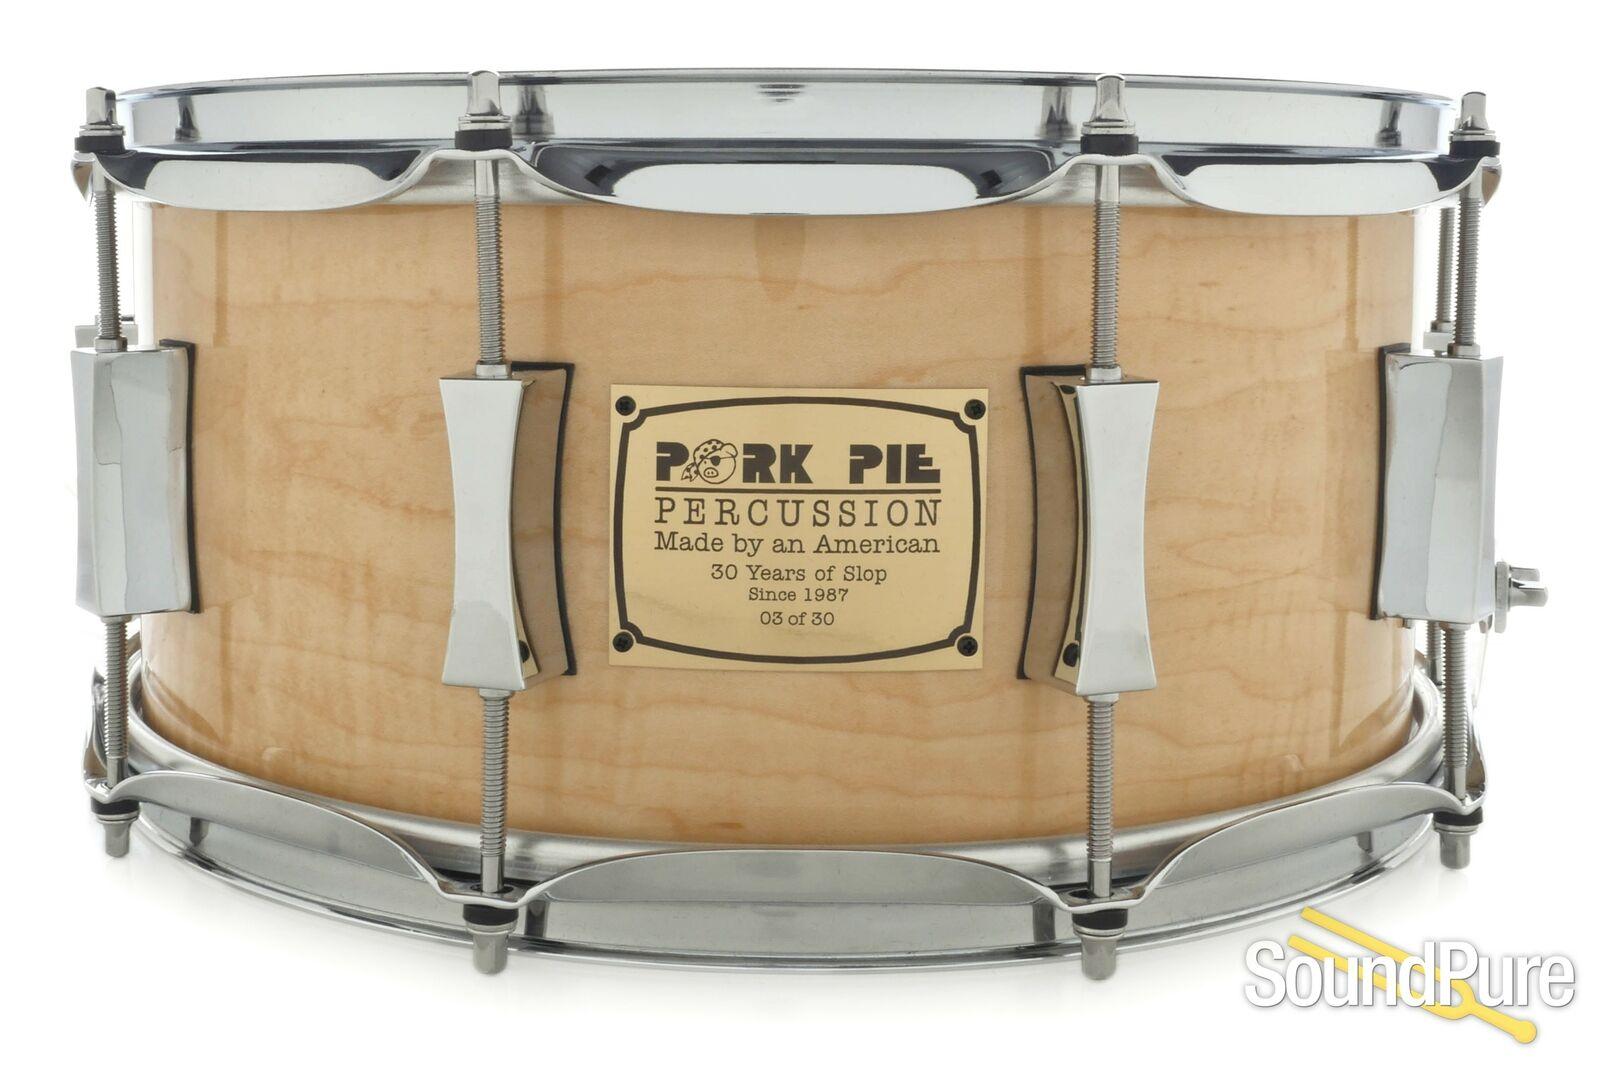 Pork Pie 6.5x14 Walnut Ply 30th Anniversary Snare Drum